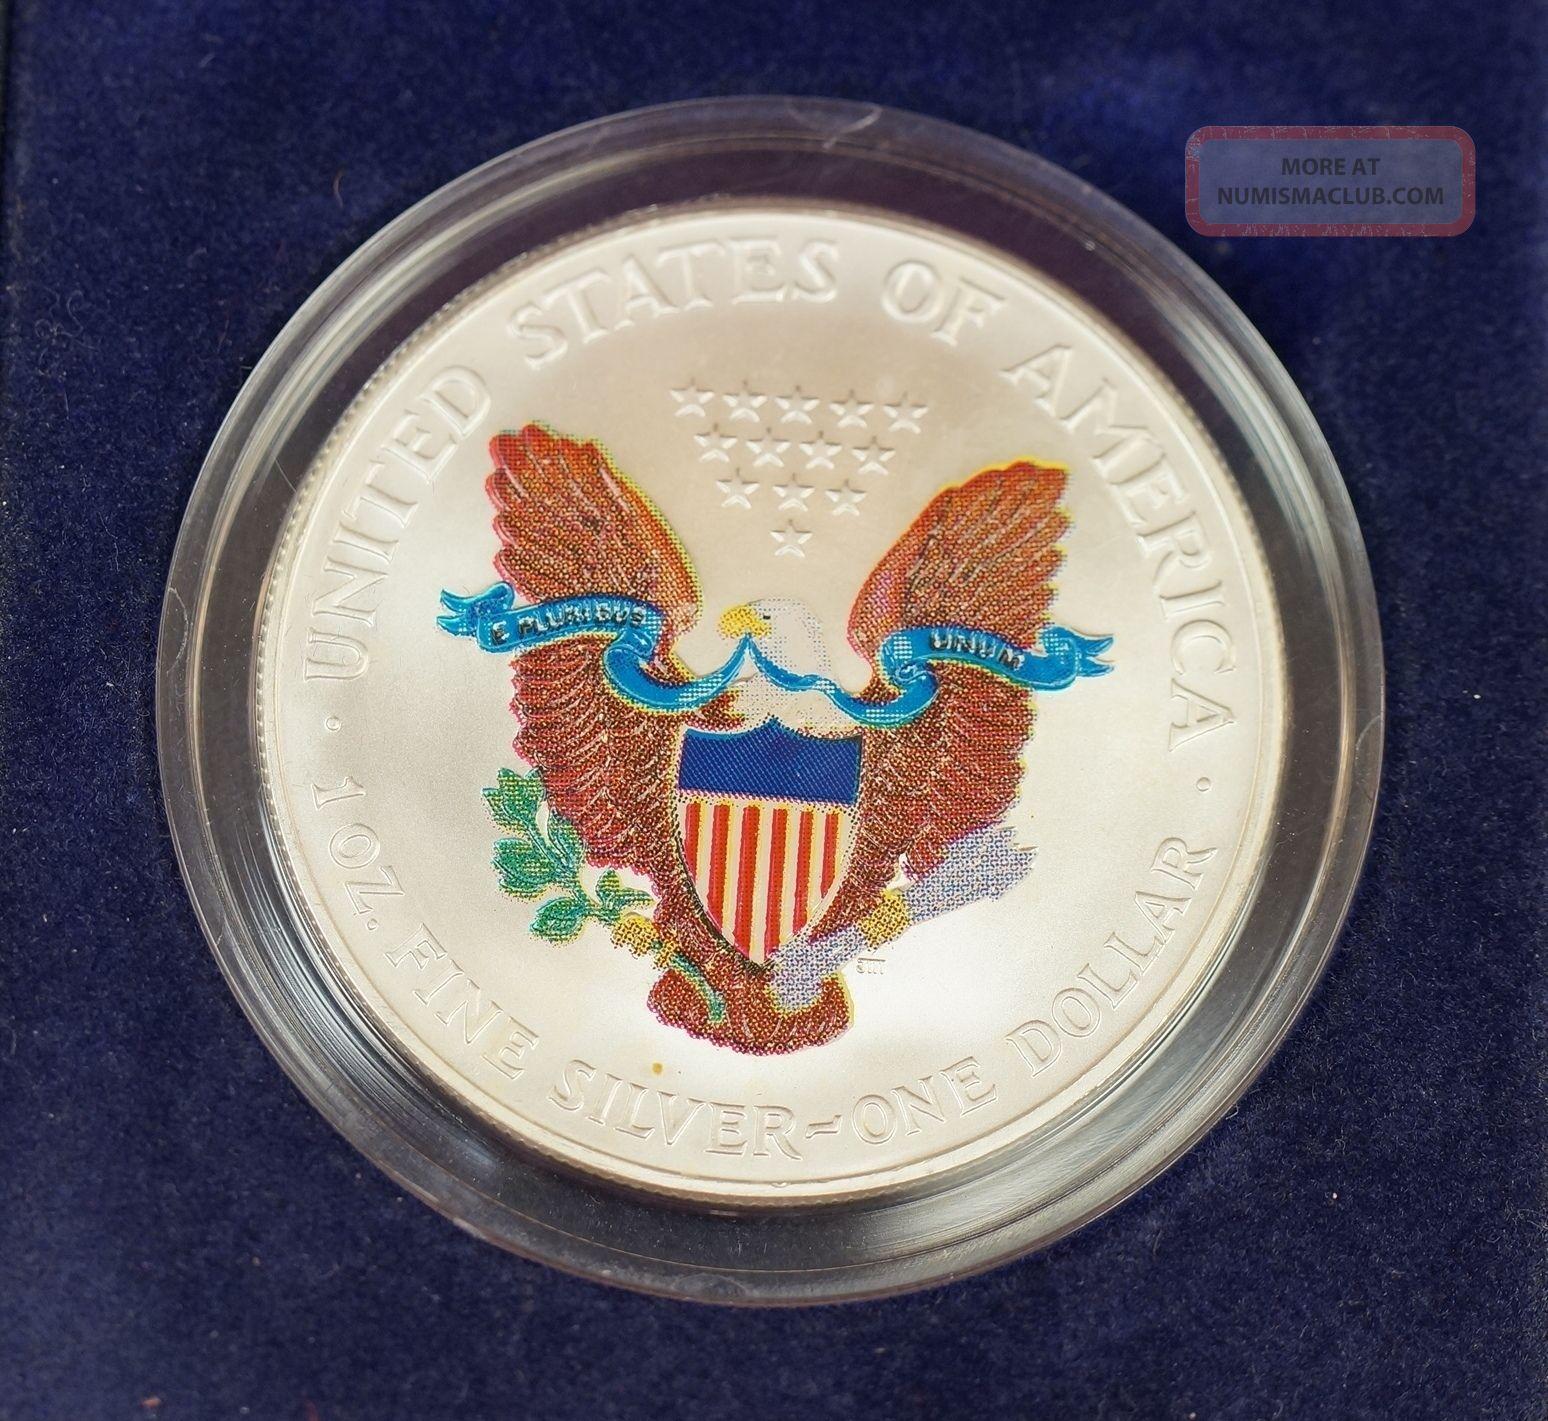 1 Ounce Silver Coin Canada 2000 Norfed One Ounce Silver